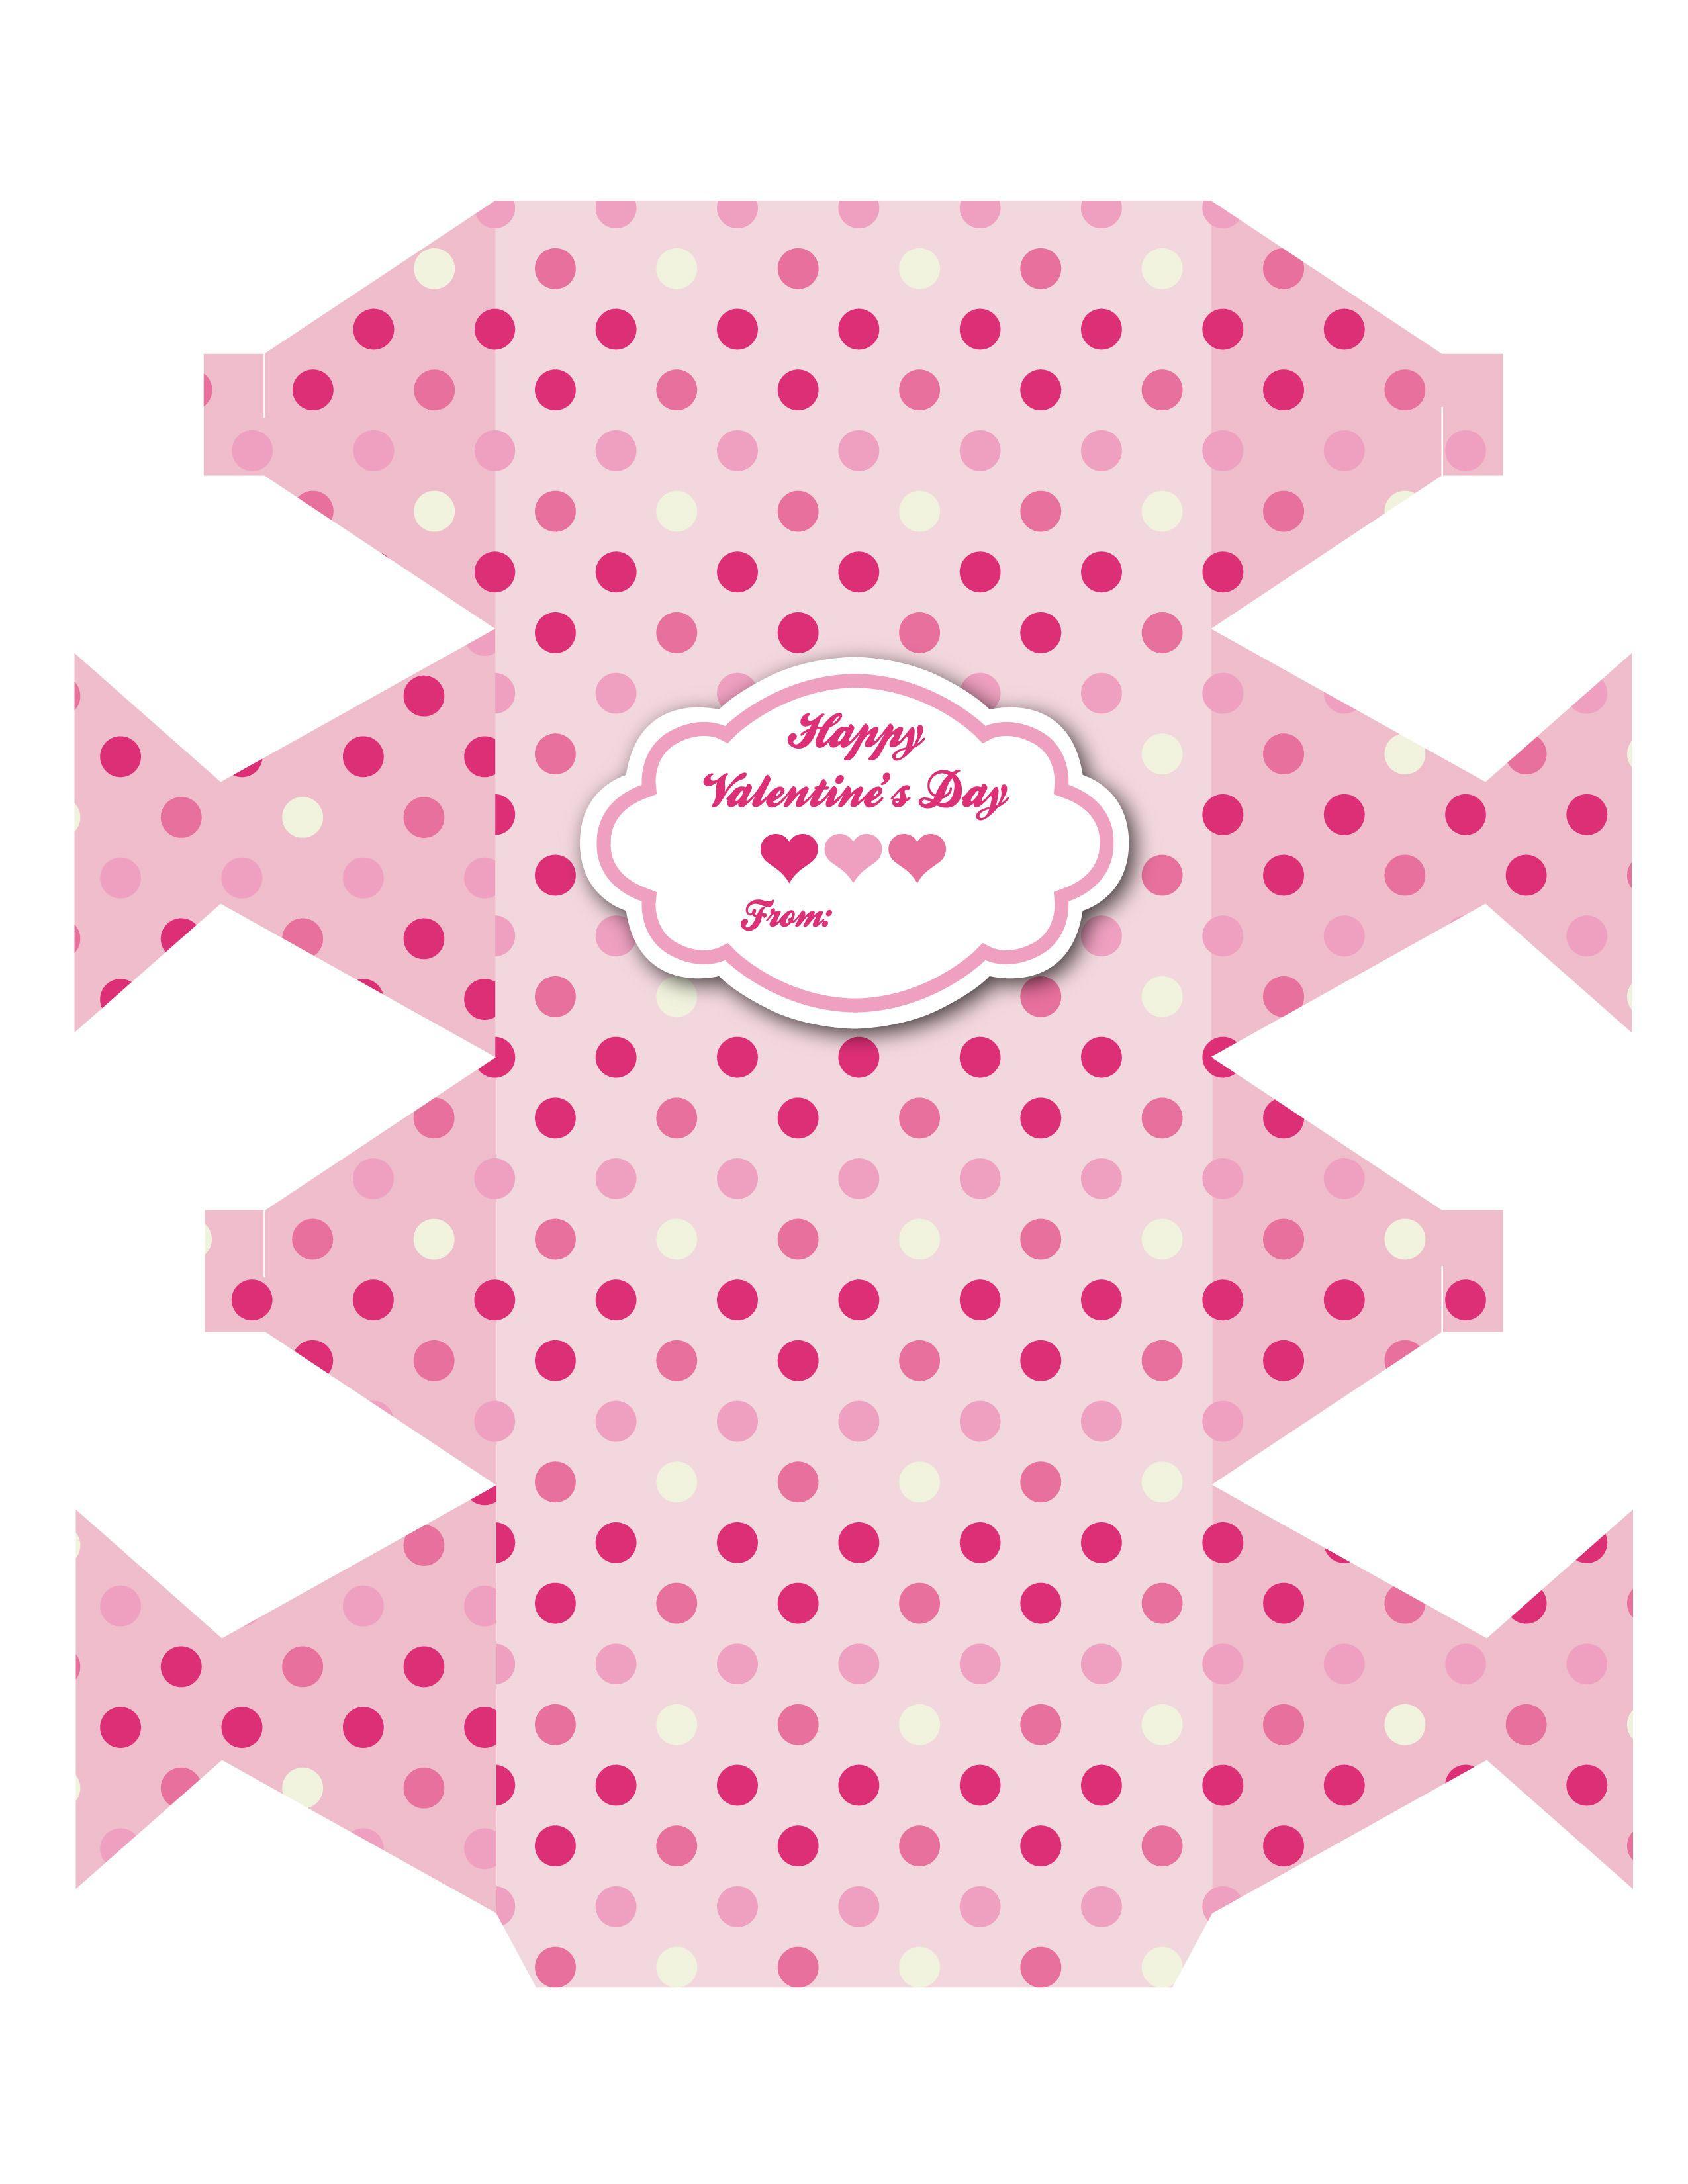 cajita para caramelos o chuches | Packaging | Pinterest | Box ...